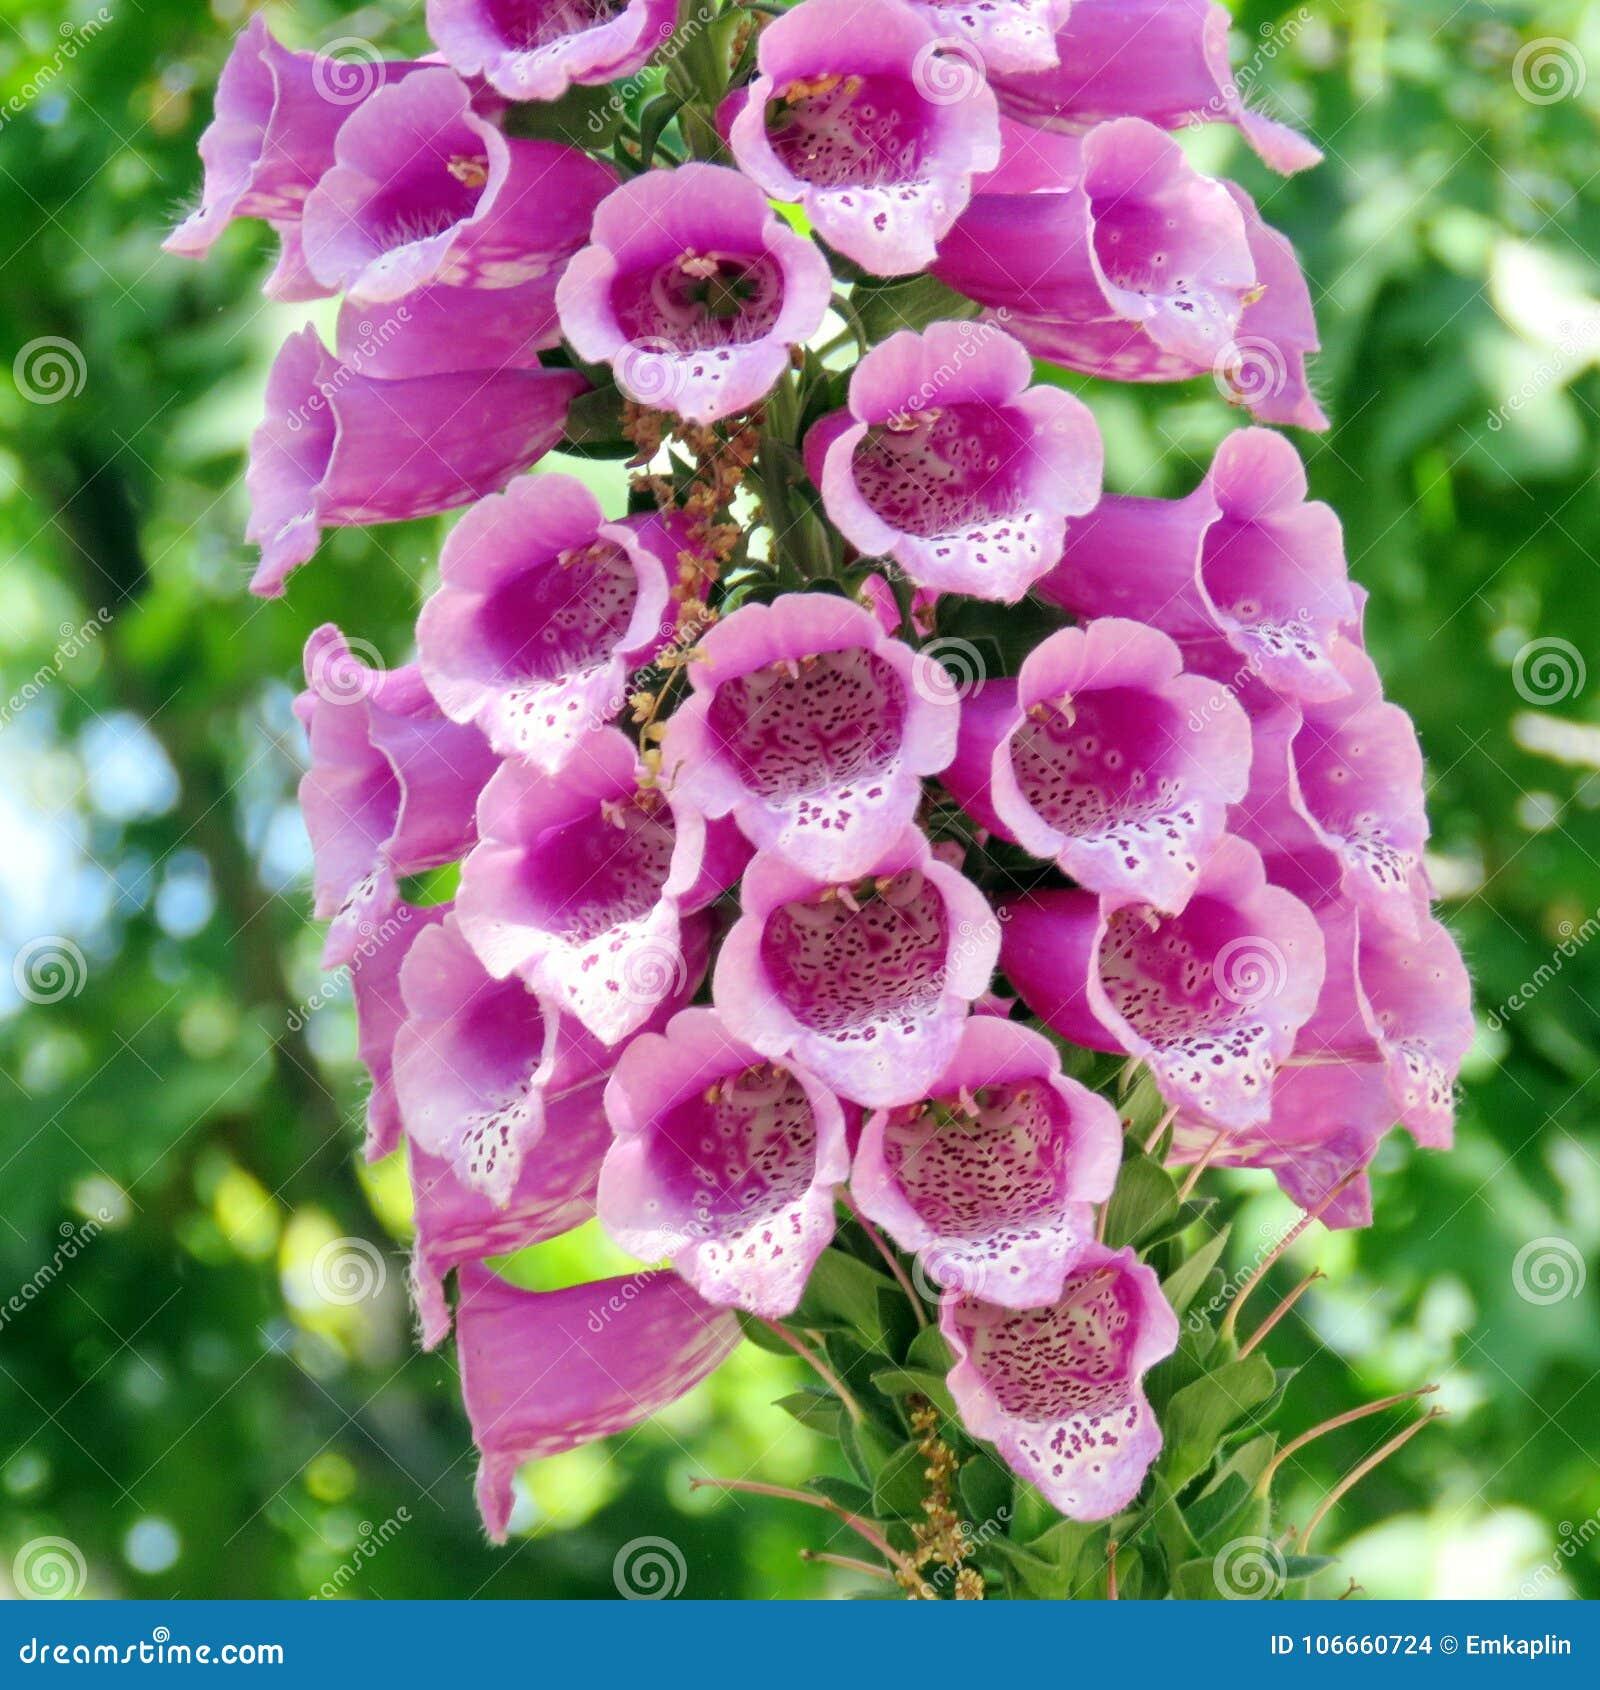 Toronto High Park Pink Foxglove Flower 2016 Stock Photo Image Of